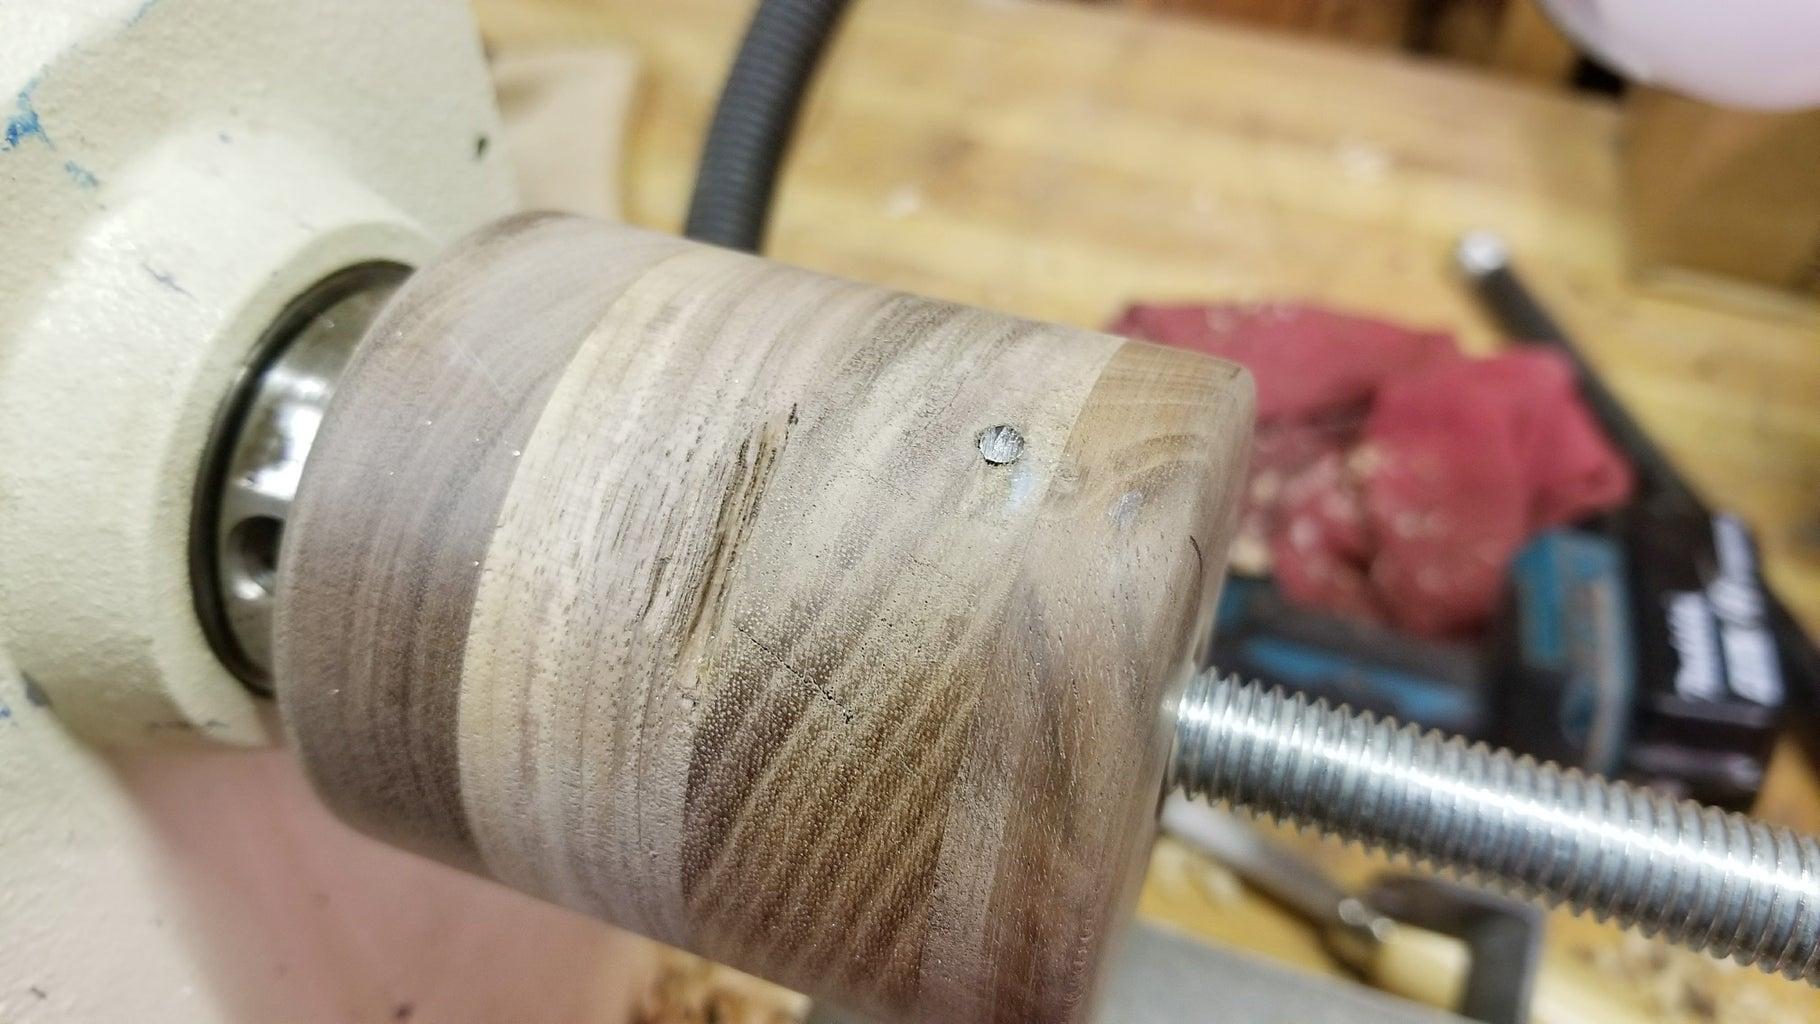 Insert Locking Pin